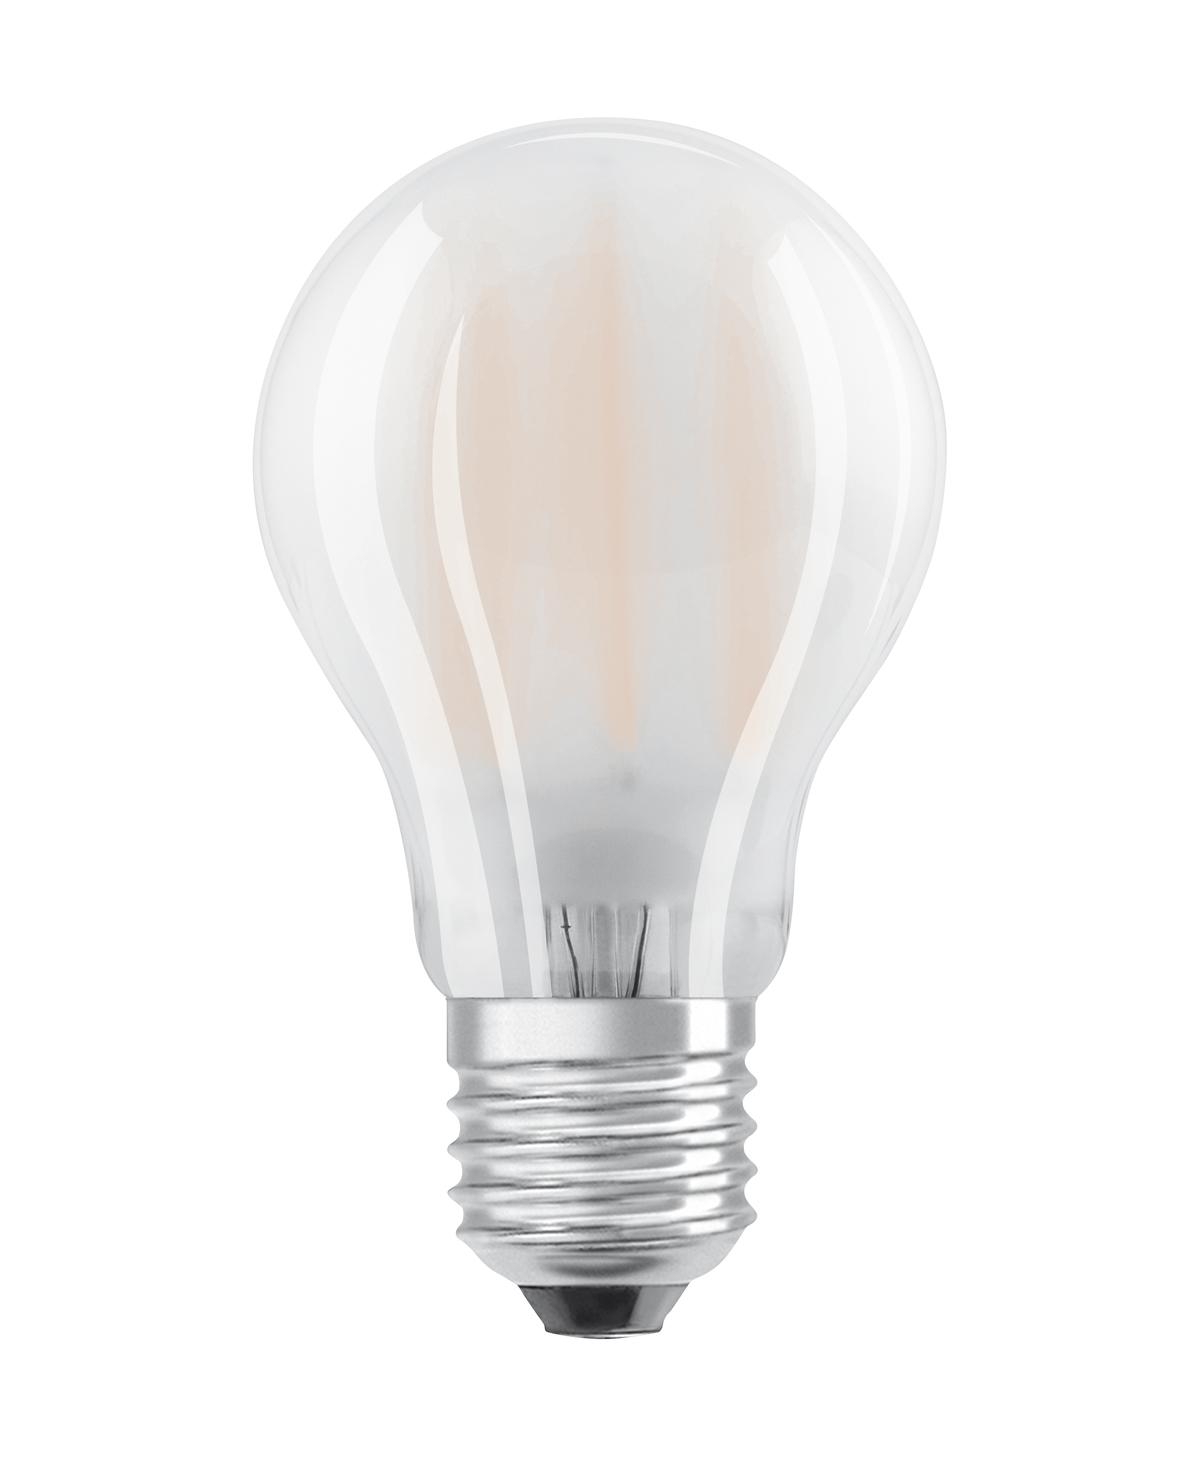 1x Philips Leuchtmittel LED-Lampe 6,5W=40W E27 2700K WarmWhite 470lm Birnenform